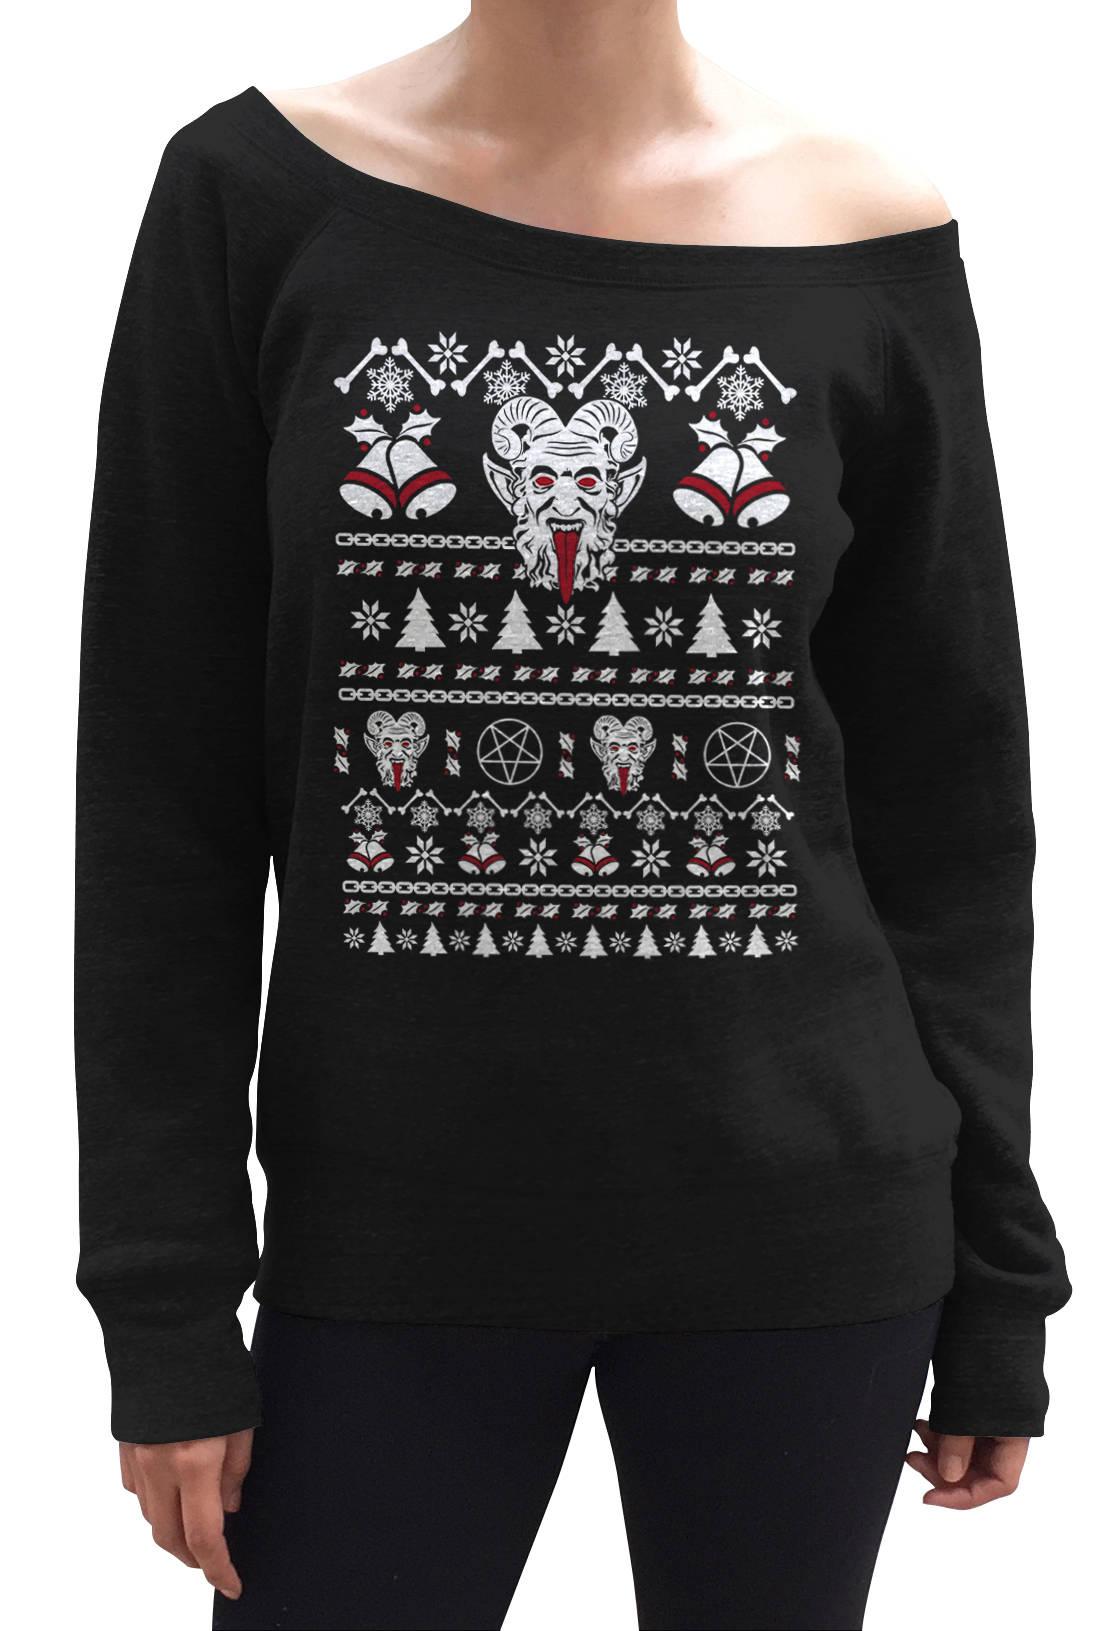 61808ef157 Ugly Krampus Christmas Sweater Scoop Neck Sweatshirt